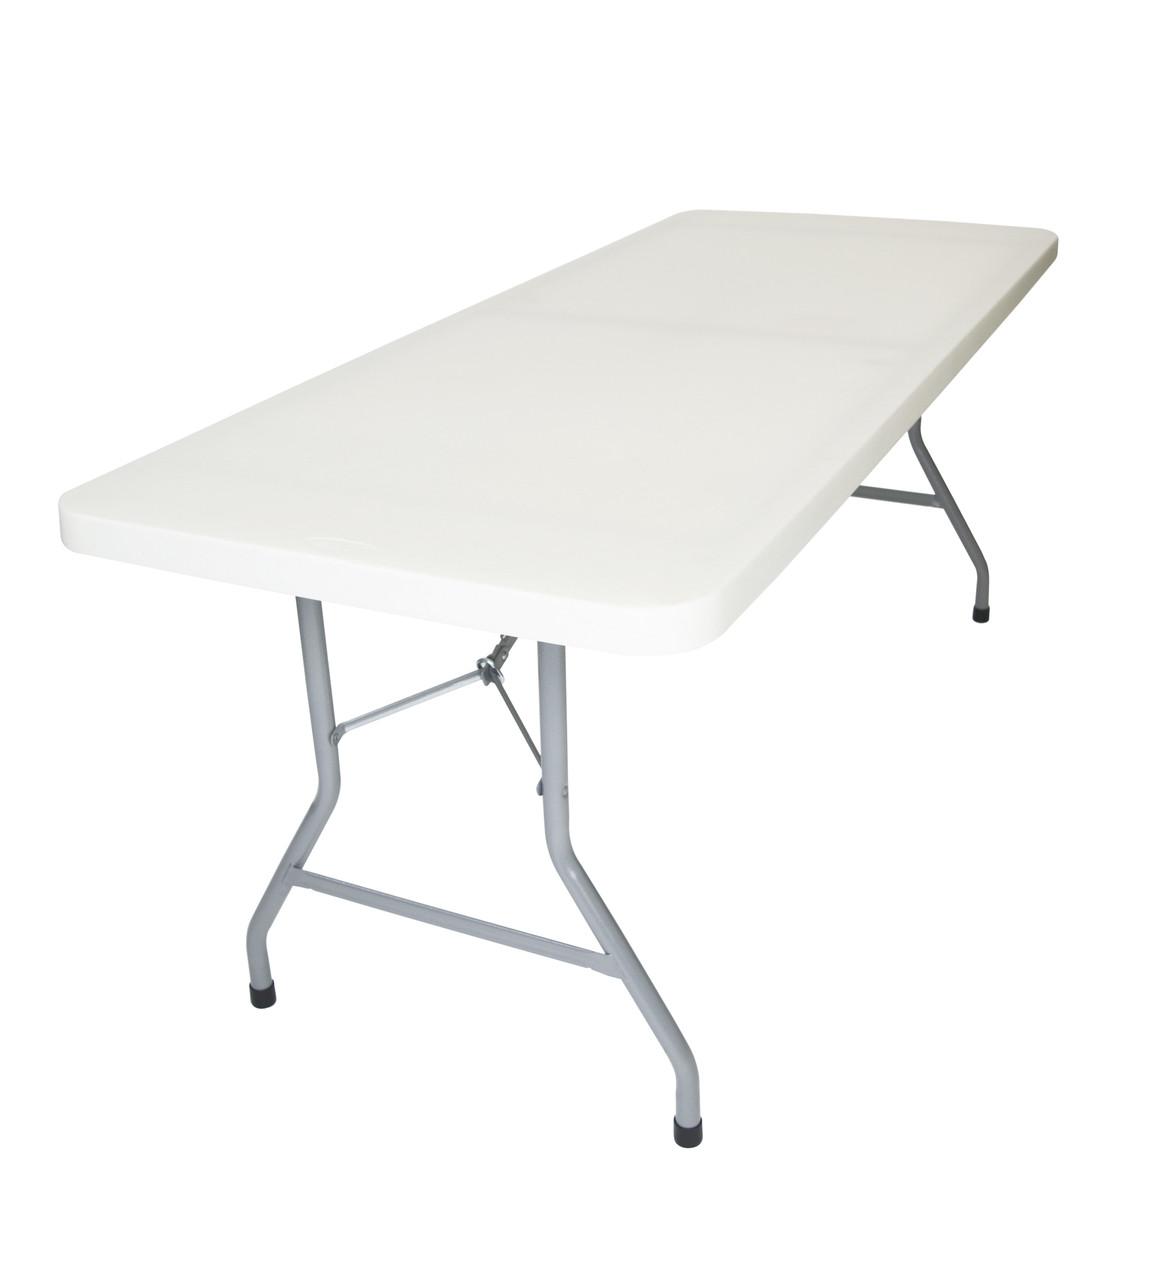 Rhinolite 30 X72 6 Ft Rectangle Plastic Folding Table Solid One Piece Top Locking Steel Frame Foldingchairsandtables Com